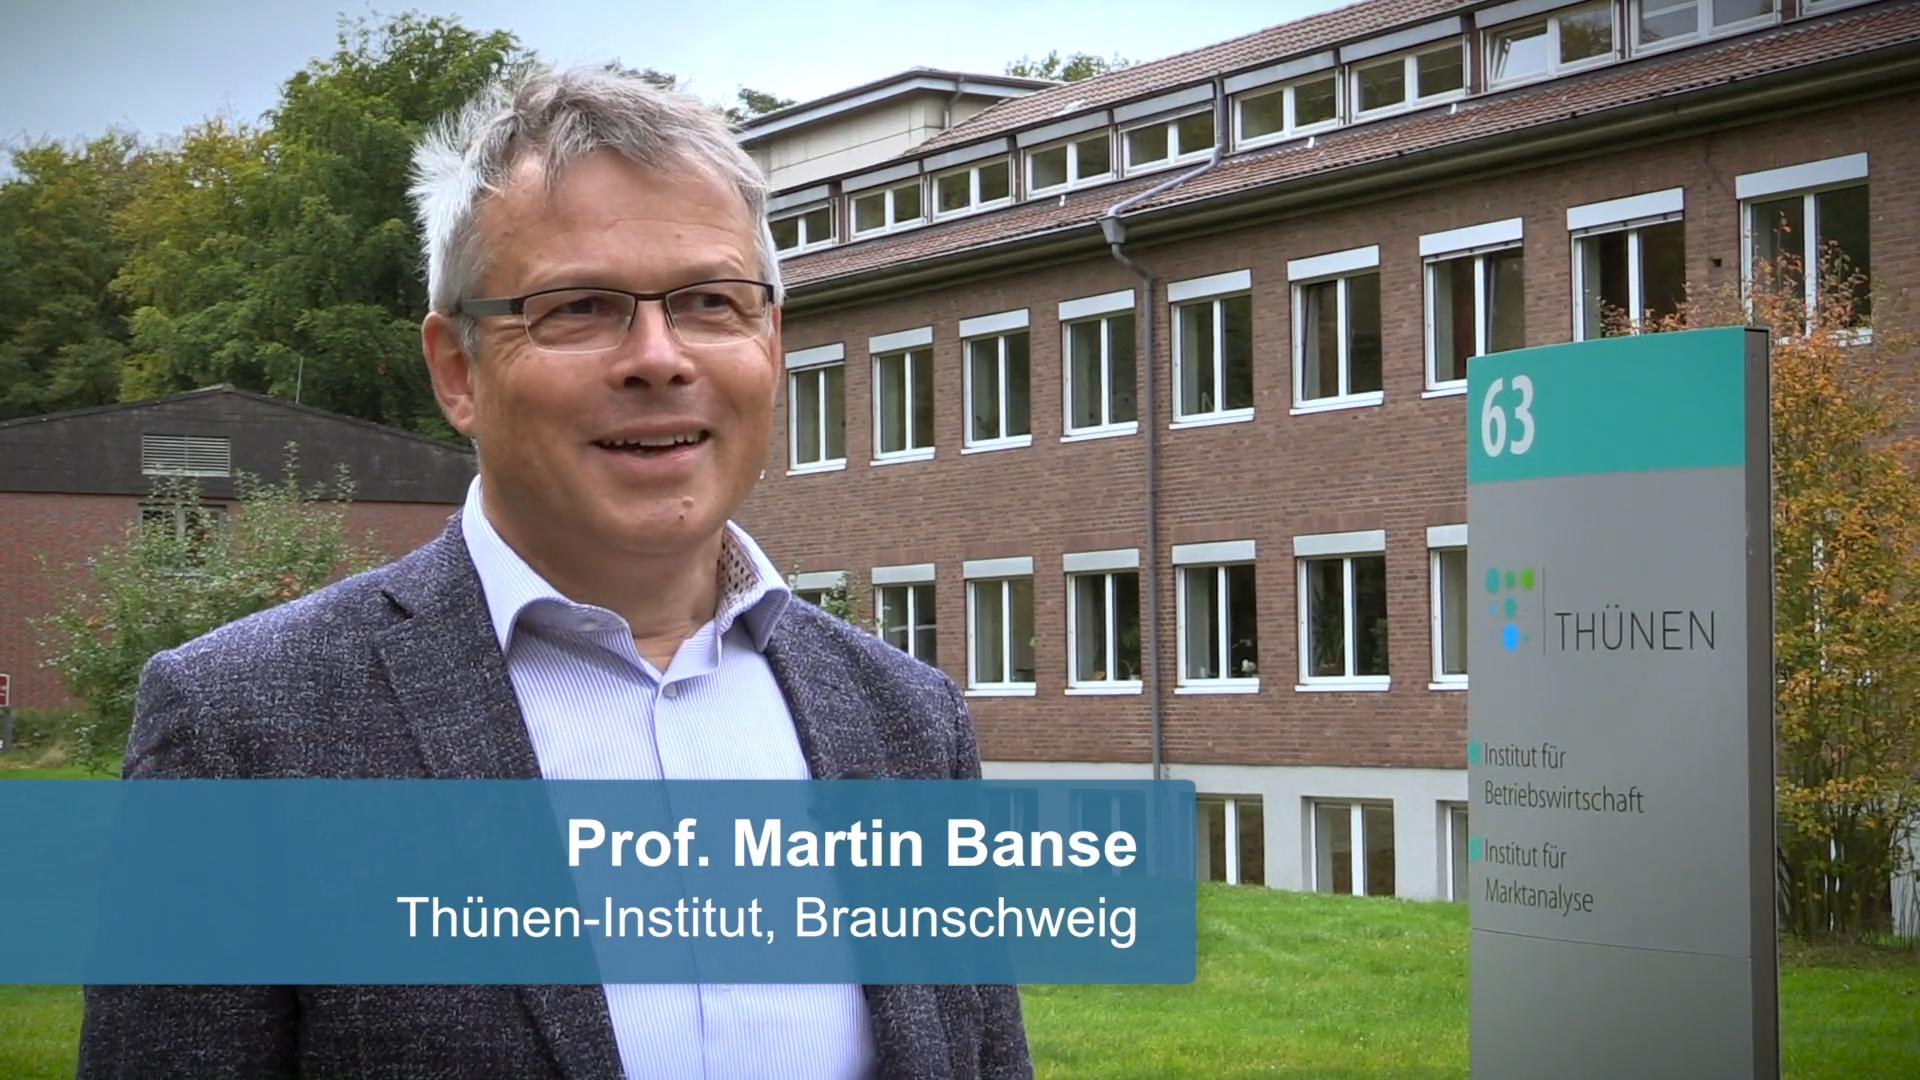 Prof. Martin Banse